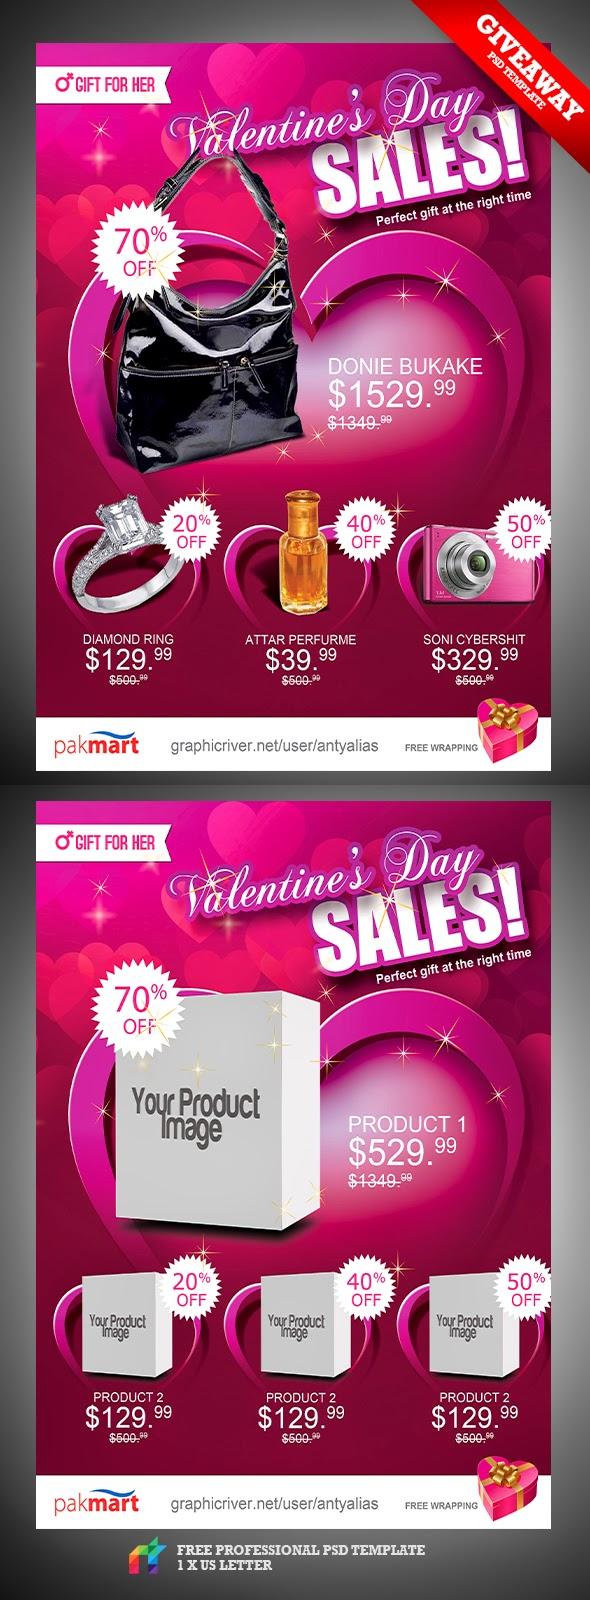 Valentine Day Sale Flyer Template